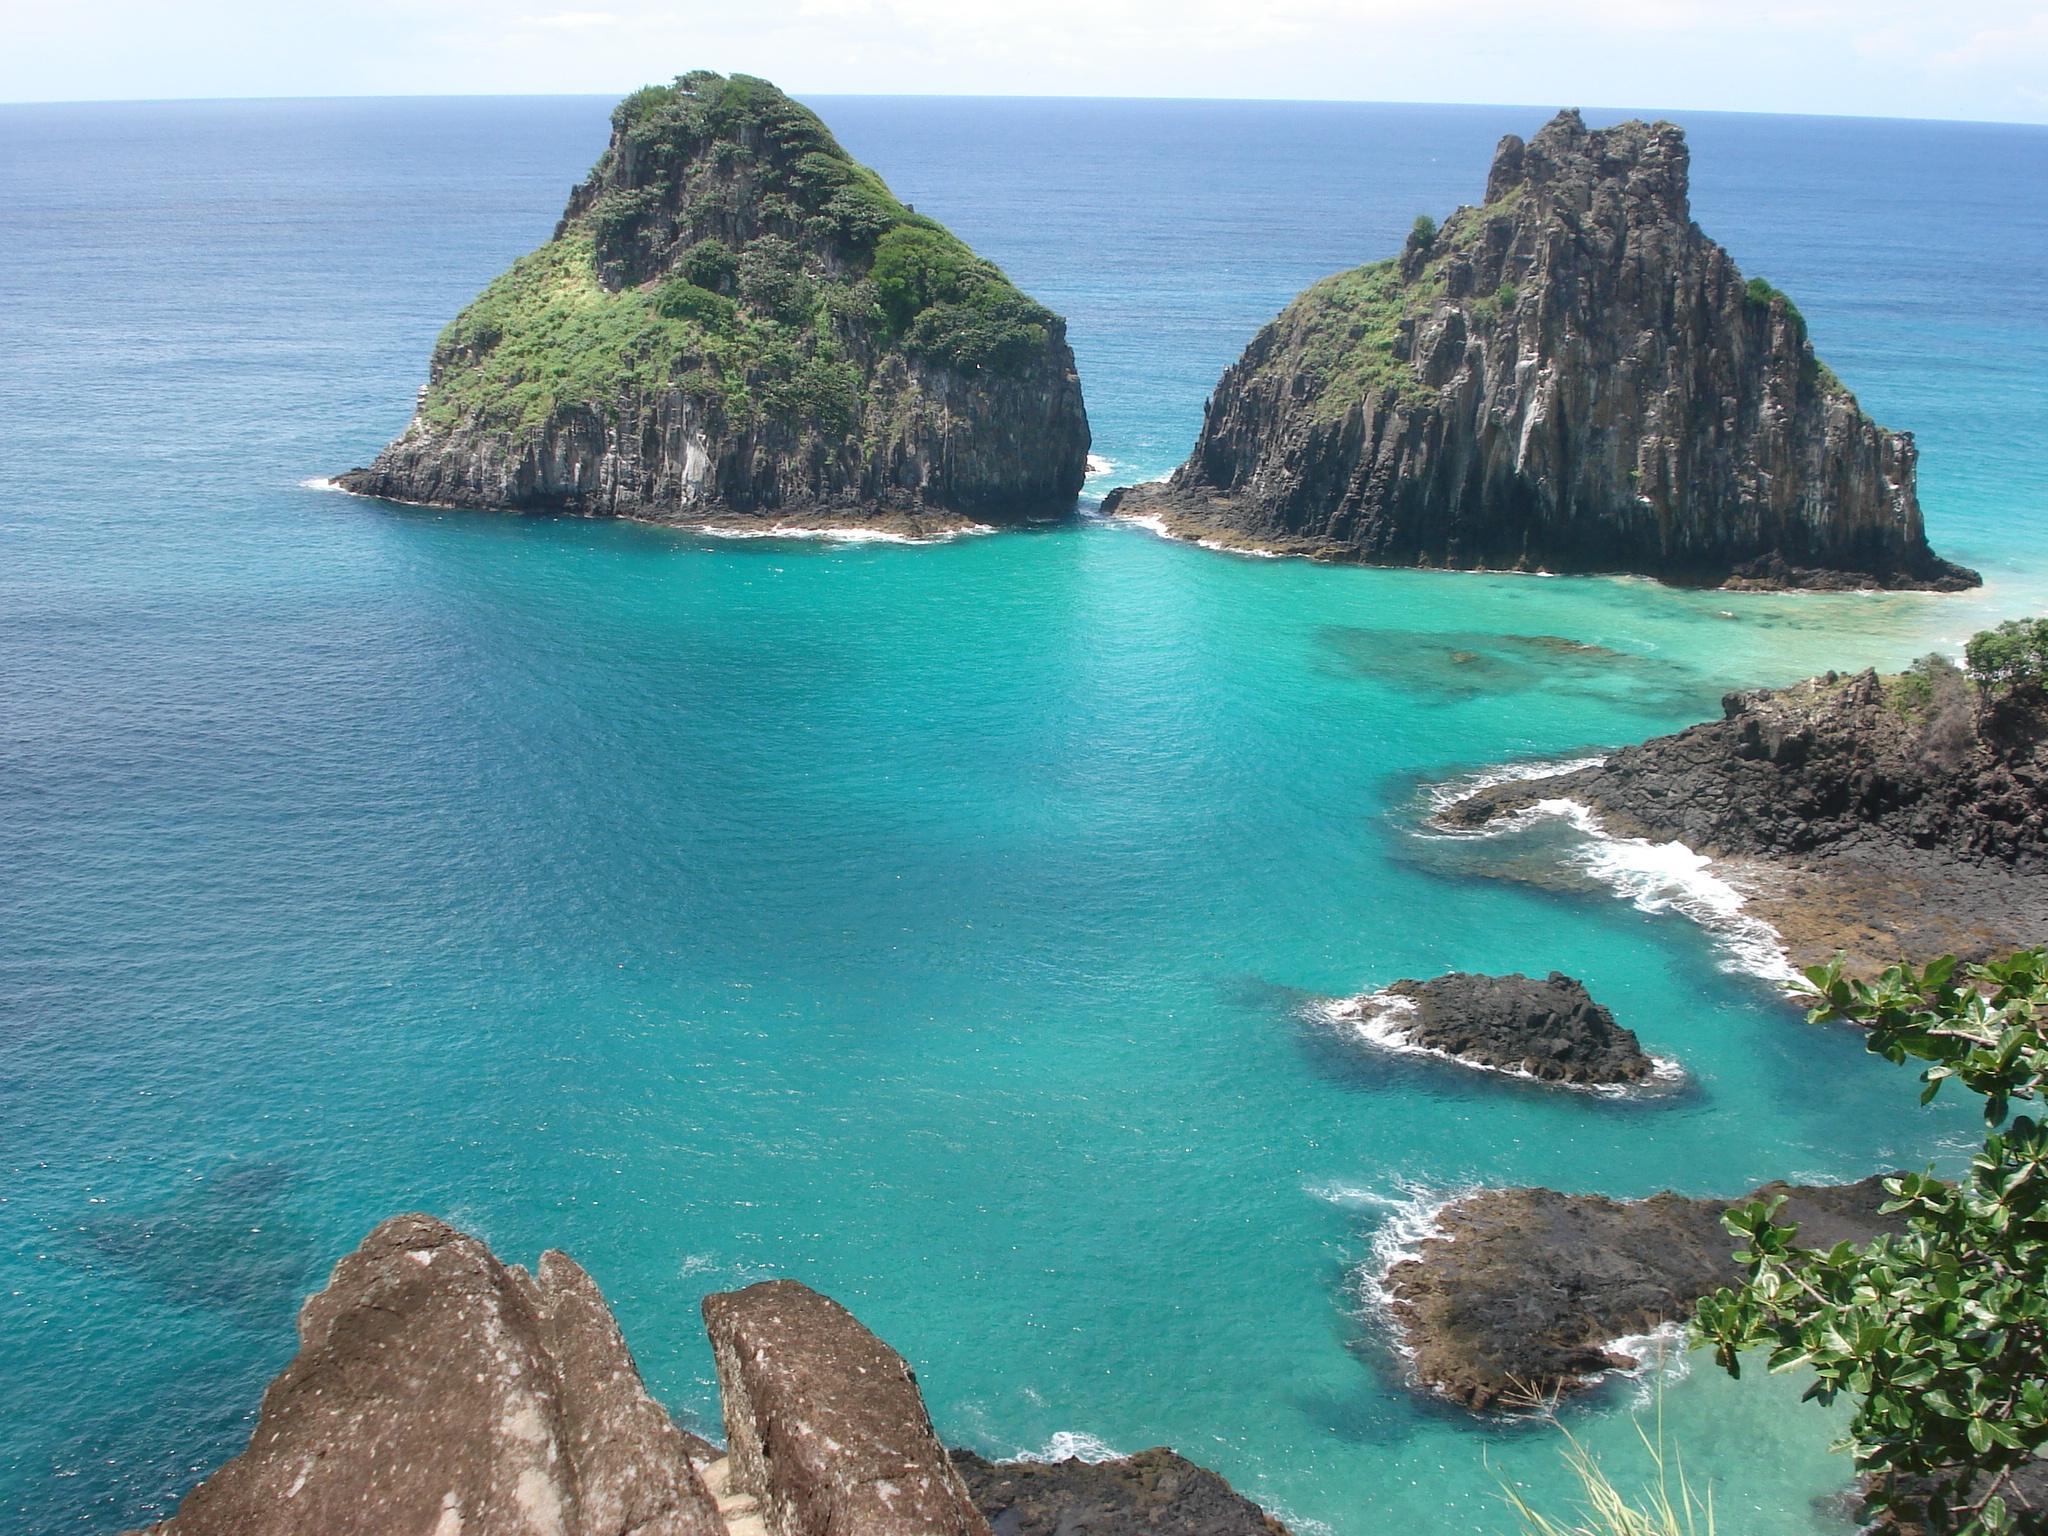 Mejores playas de brasil para solteros